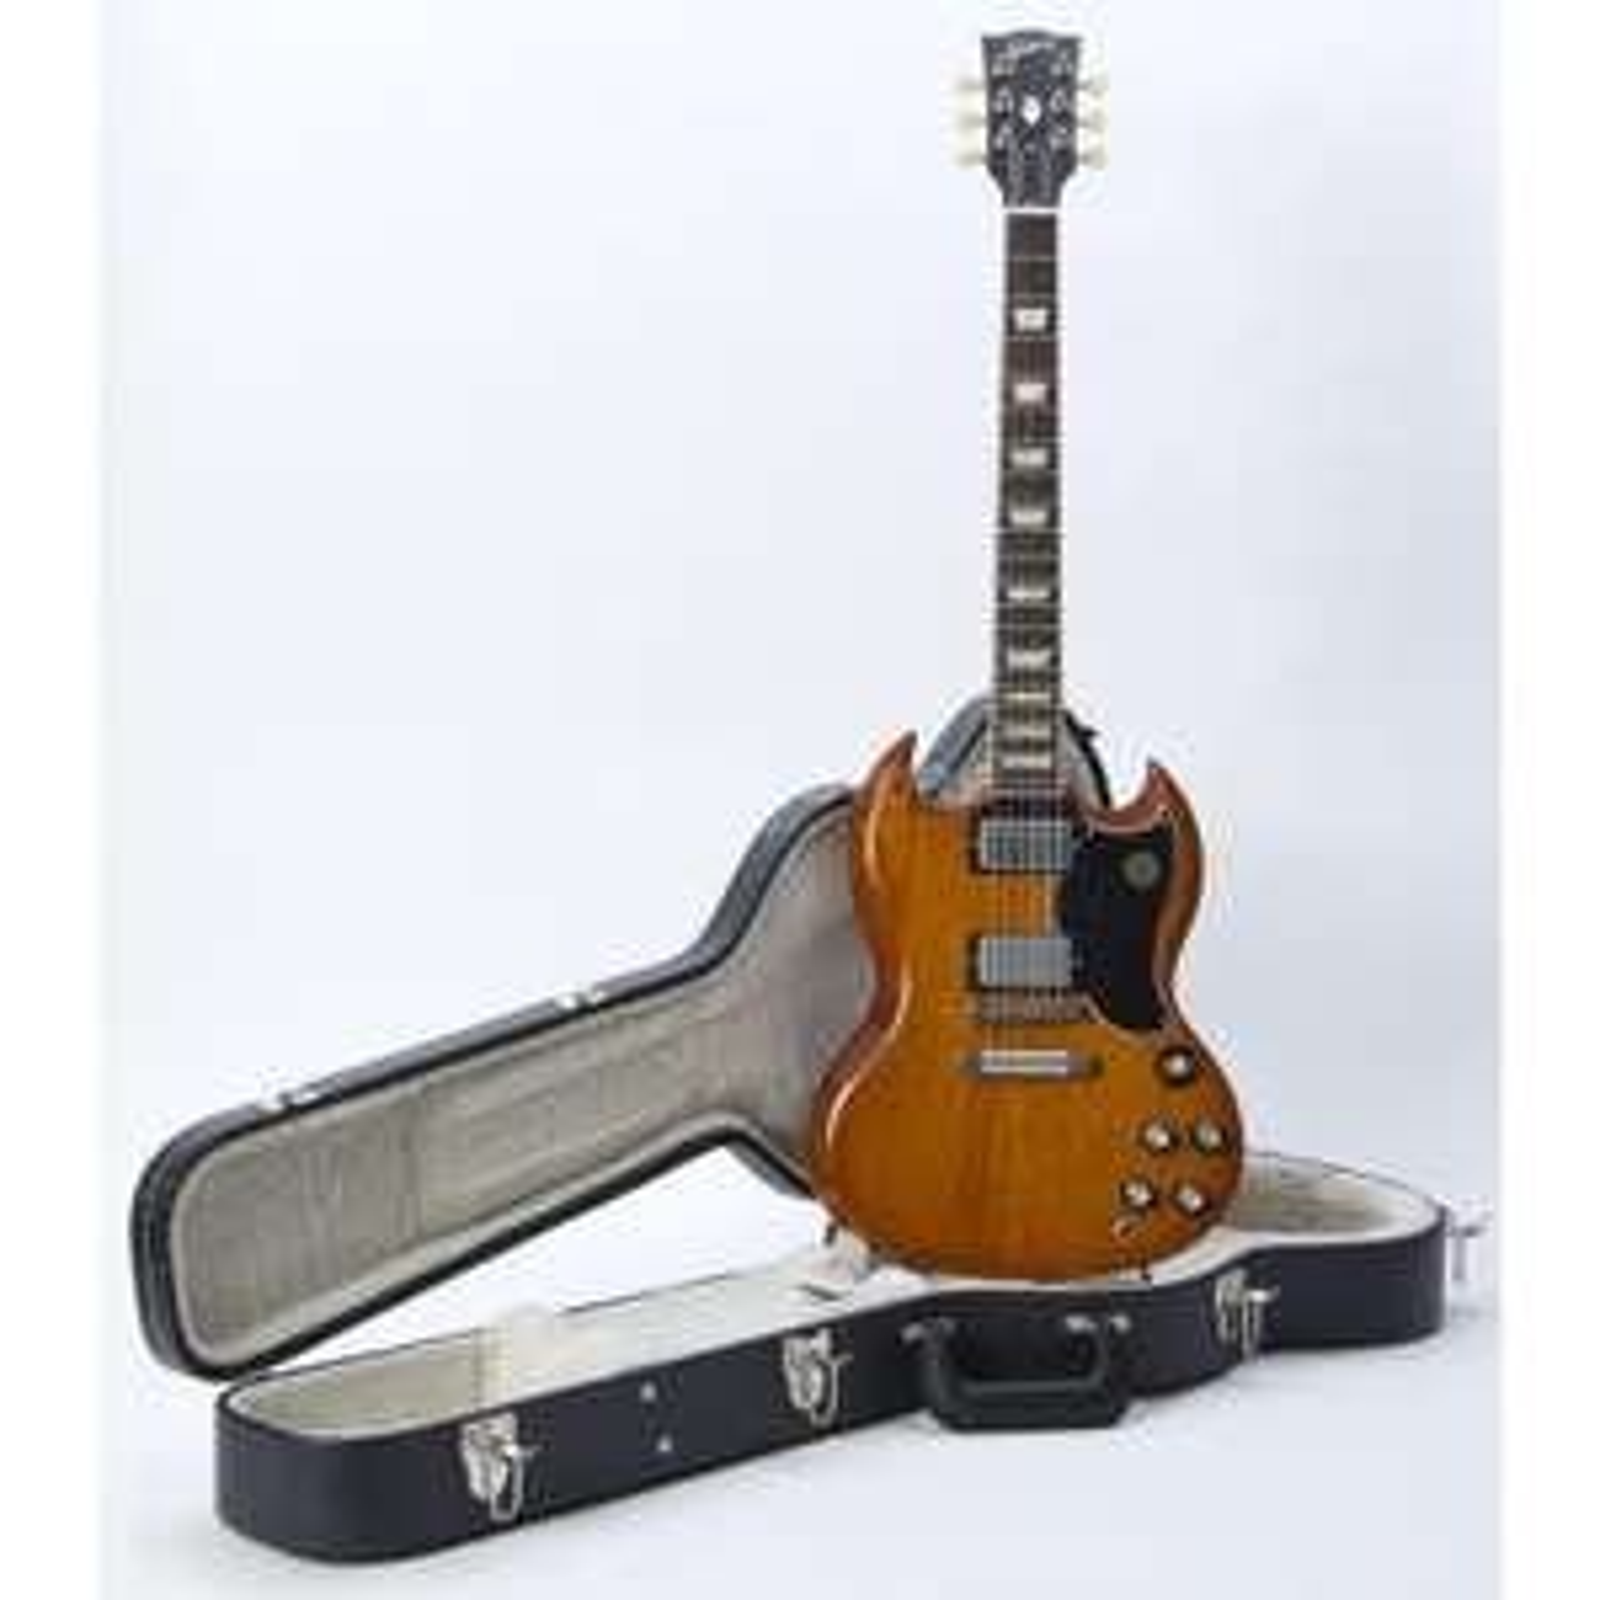 Guitare électrique Gibson SG Standard - 2013